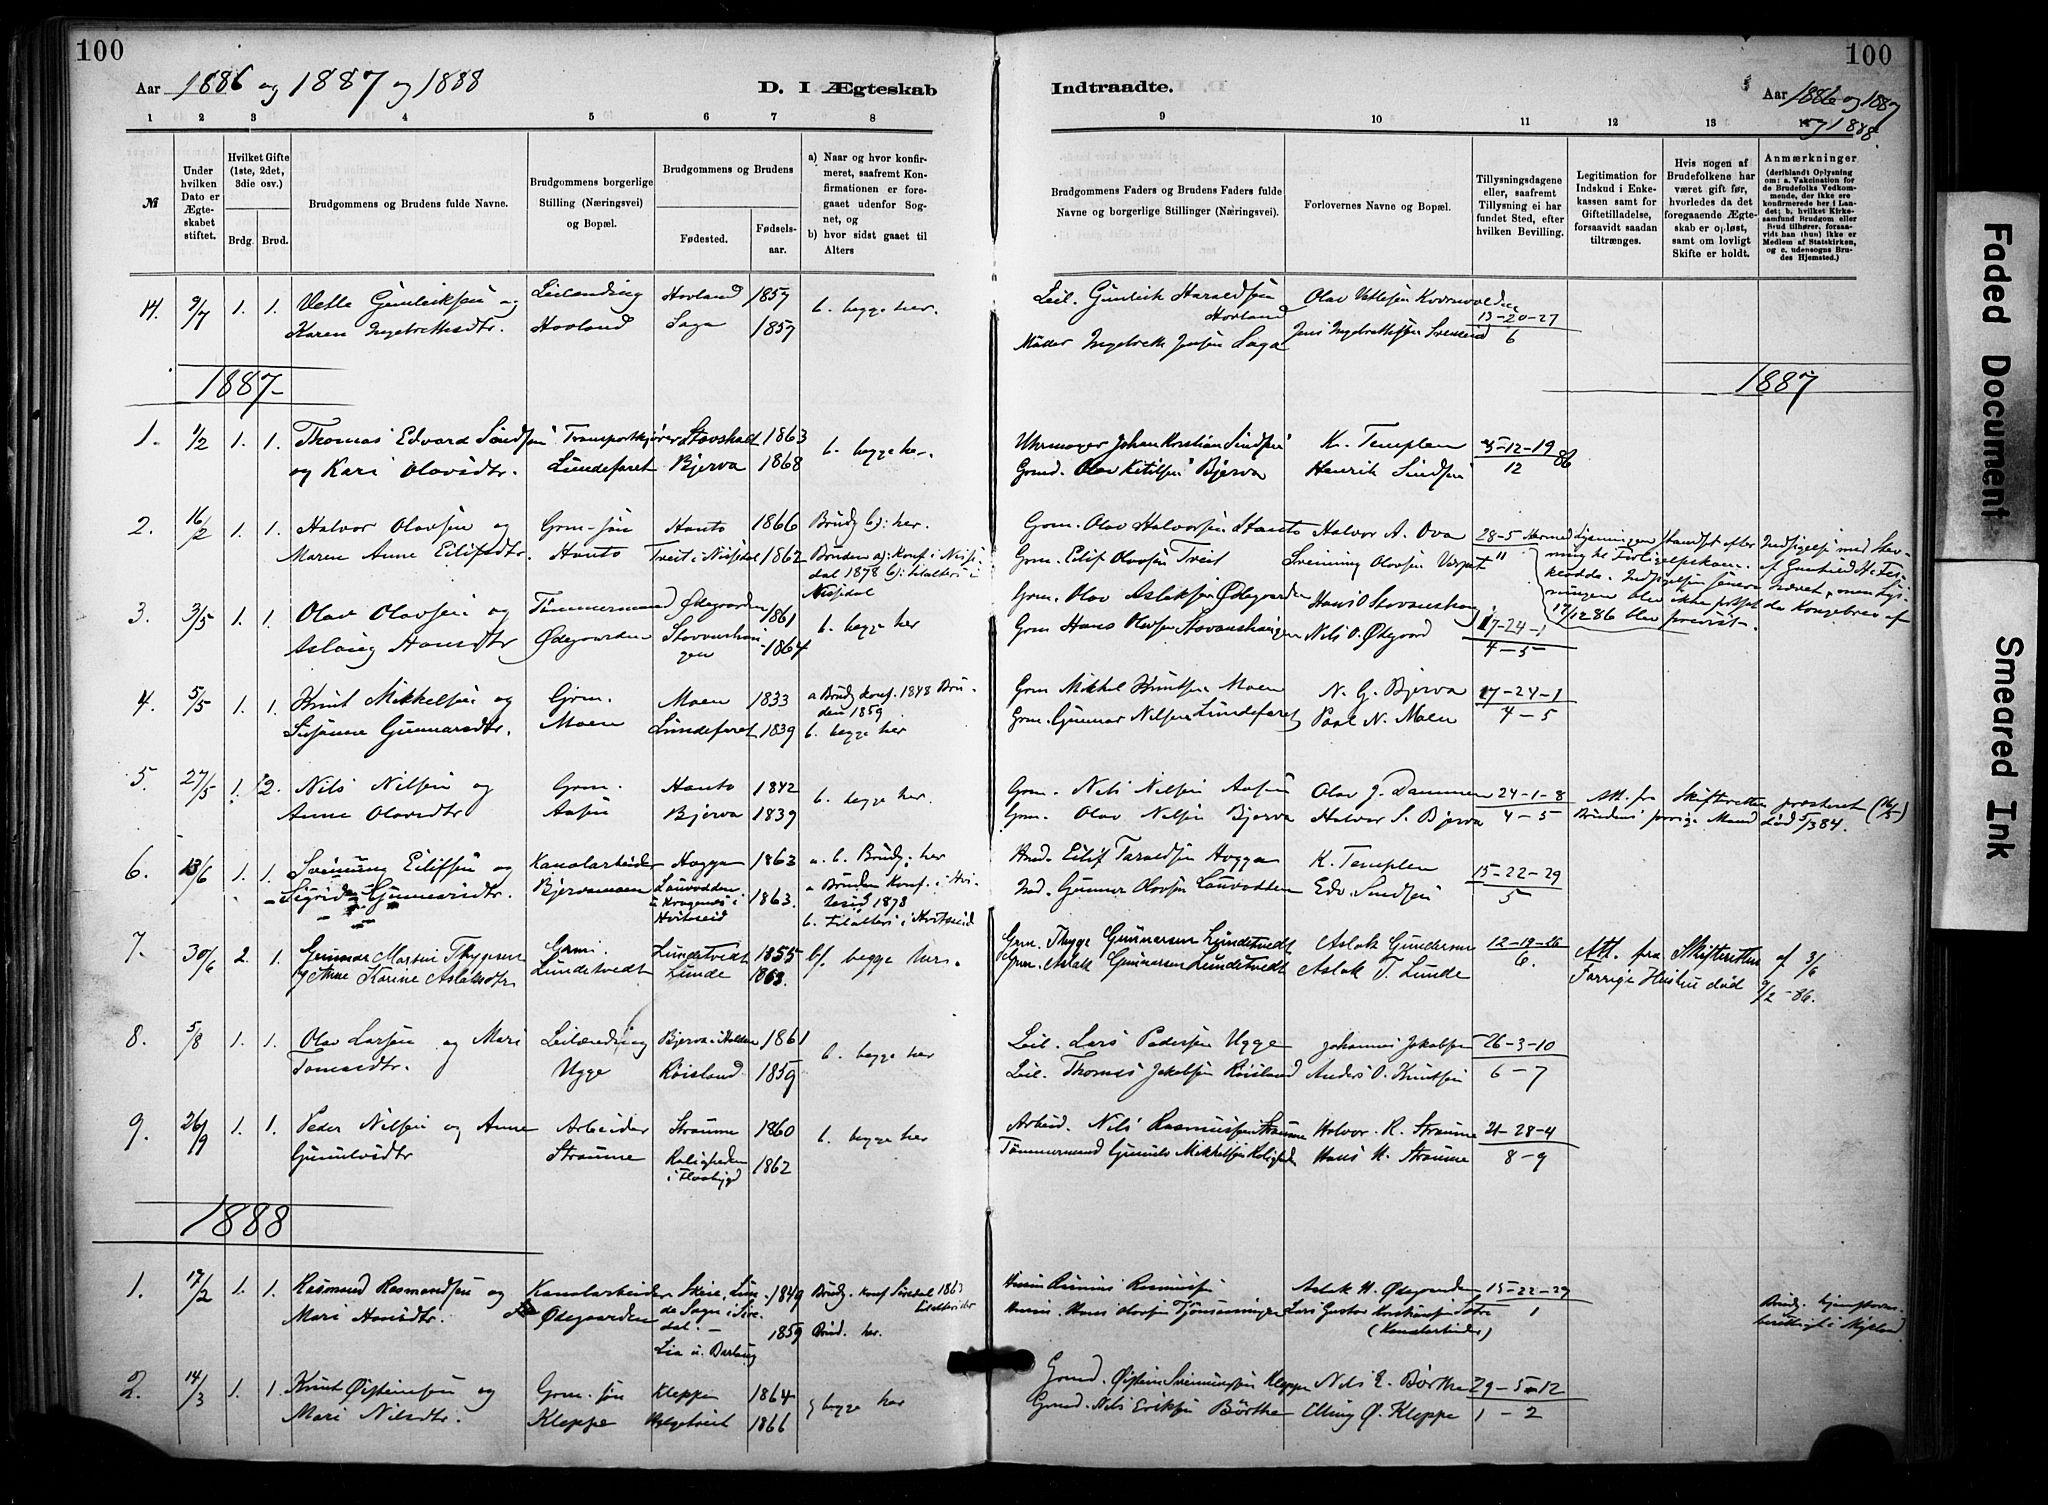 SAKO, Lunde kirkebøker, F/Fa/L0002: Ministerialbok nr. I 2, 1884-1892, s. 100